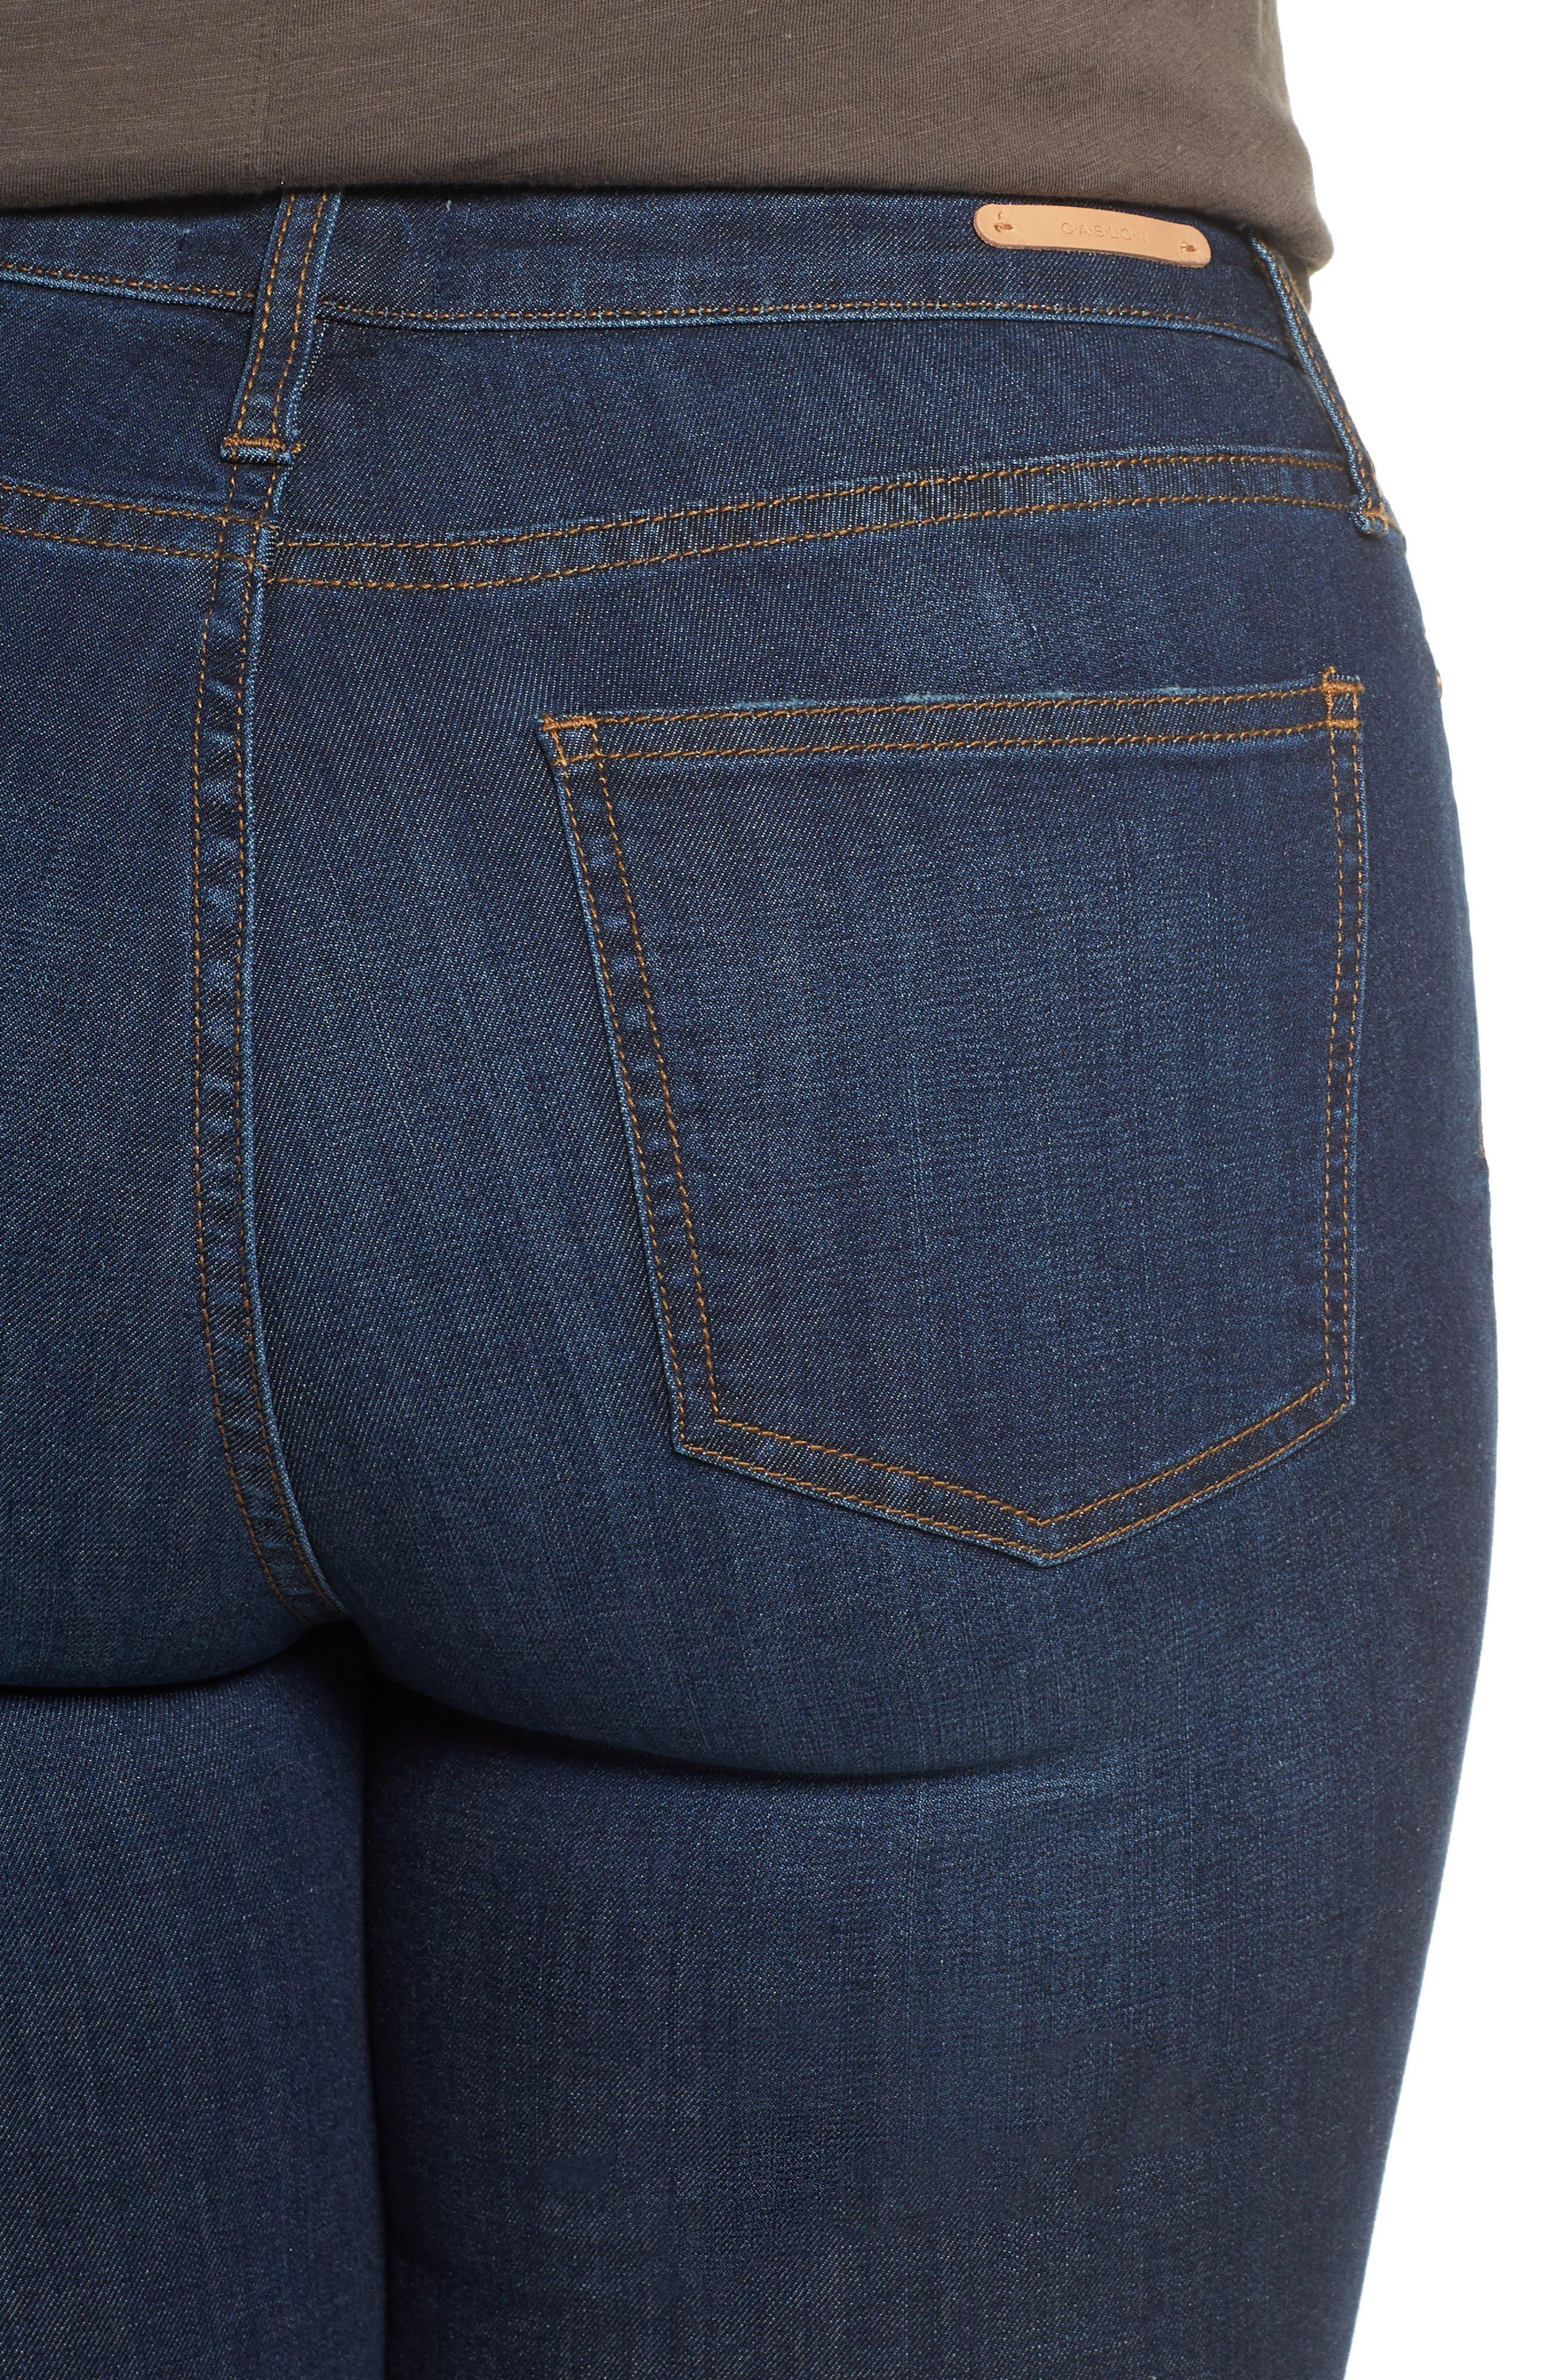 Stretch Skinny Jeans,                             Alternate thumbnail 4, color,                             MEDIUM WASH